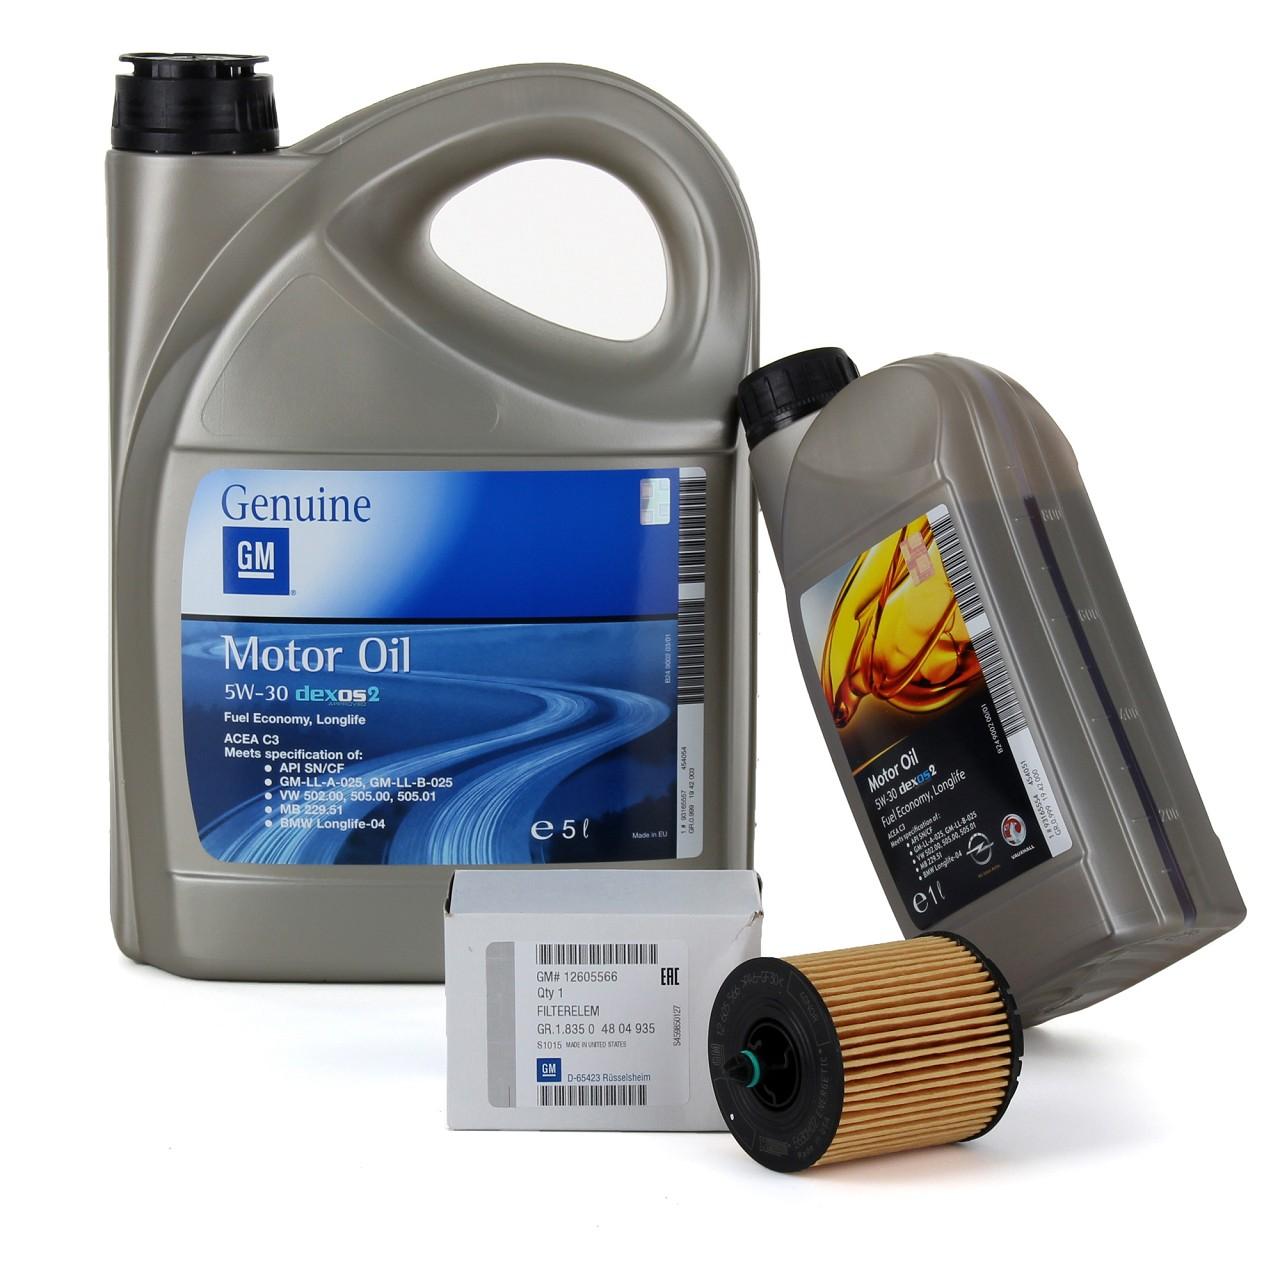 6L 6 Liter ORIGINAL OPEL MOTORÖL 5W-30 dexos2 Longlife + Ölfilter 12605566